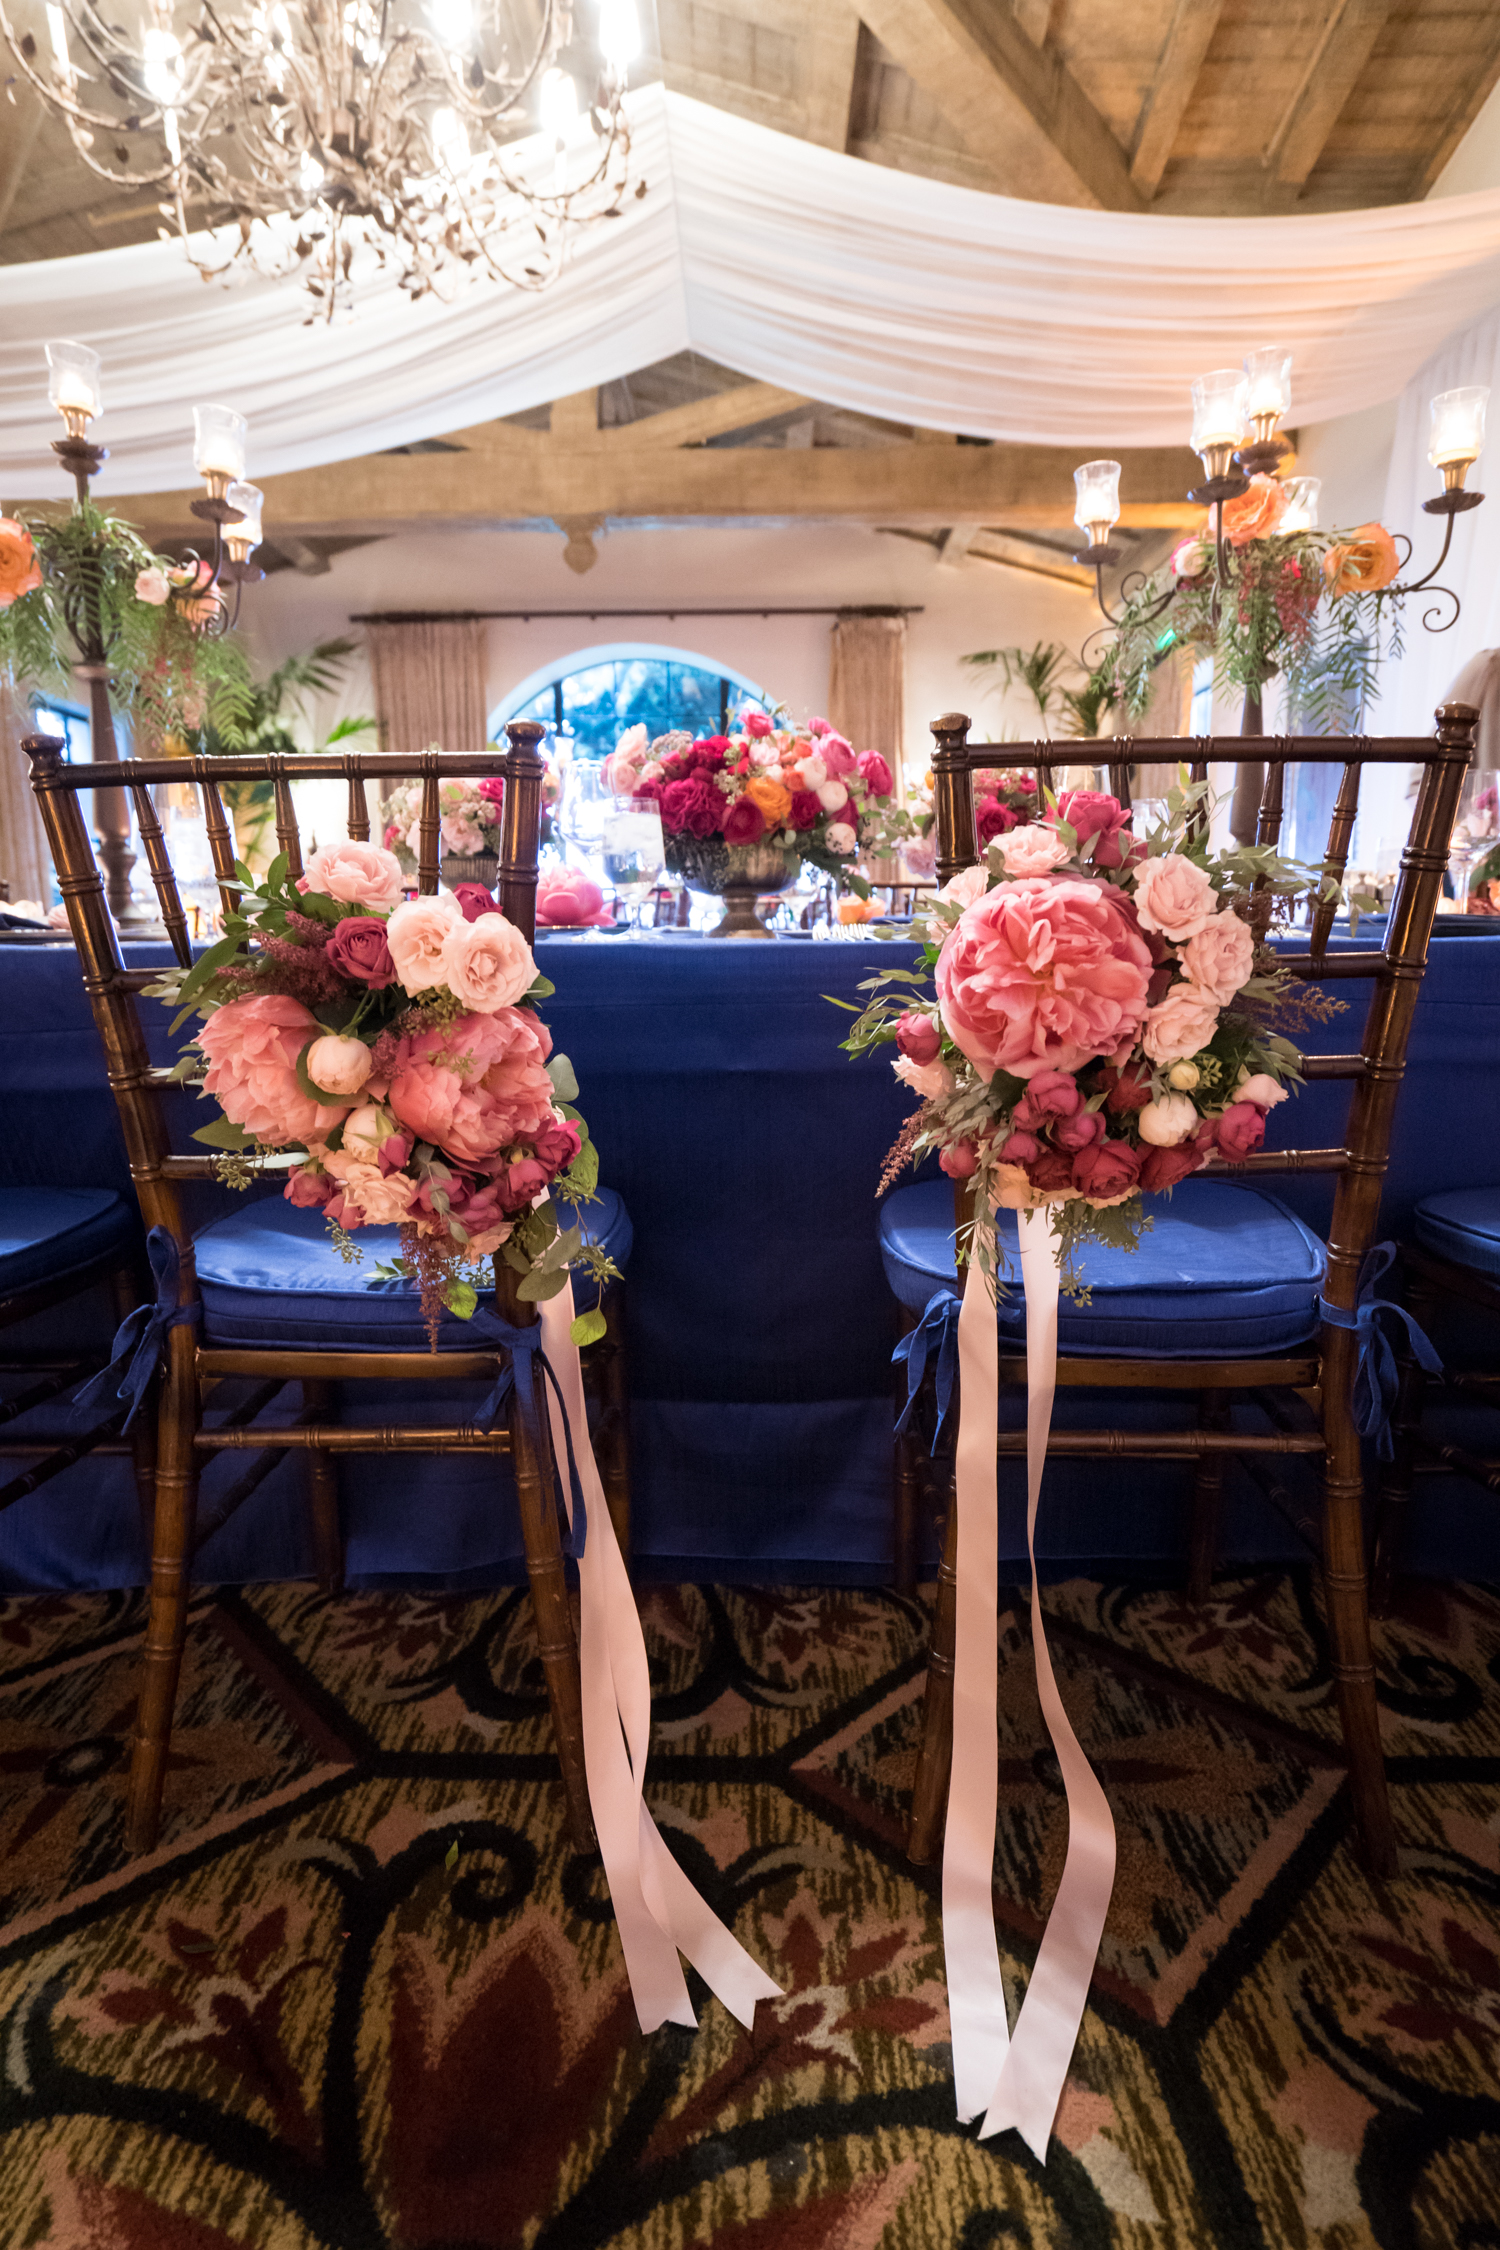 www.santabarbarawedding.com | Miki & Sonja Photography | Four Seasons Resort The Biltmore | Imagine Weddings & Special Events | La Tavola Linens | Tino Productions | Reception Tables